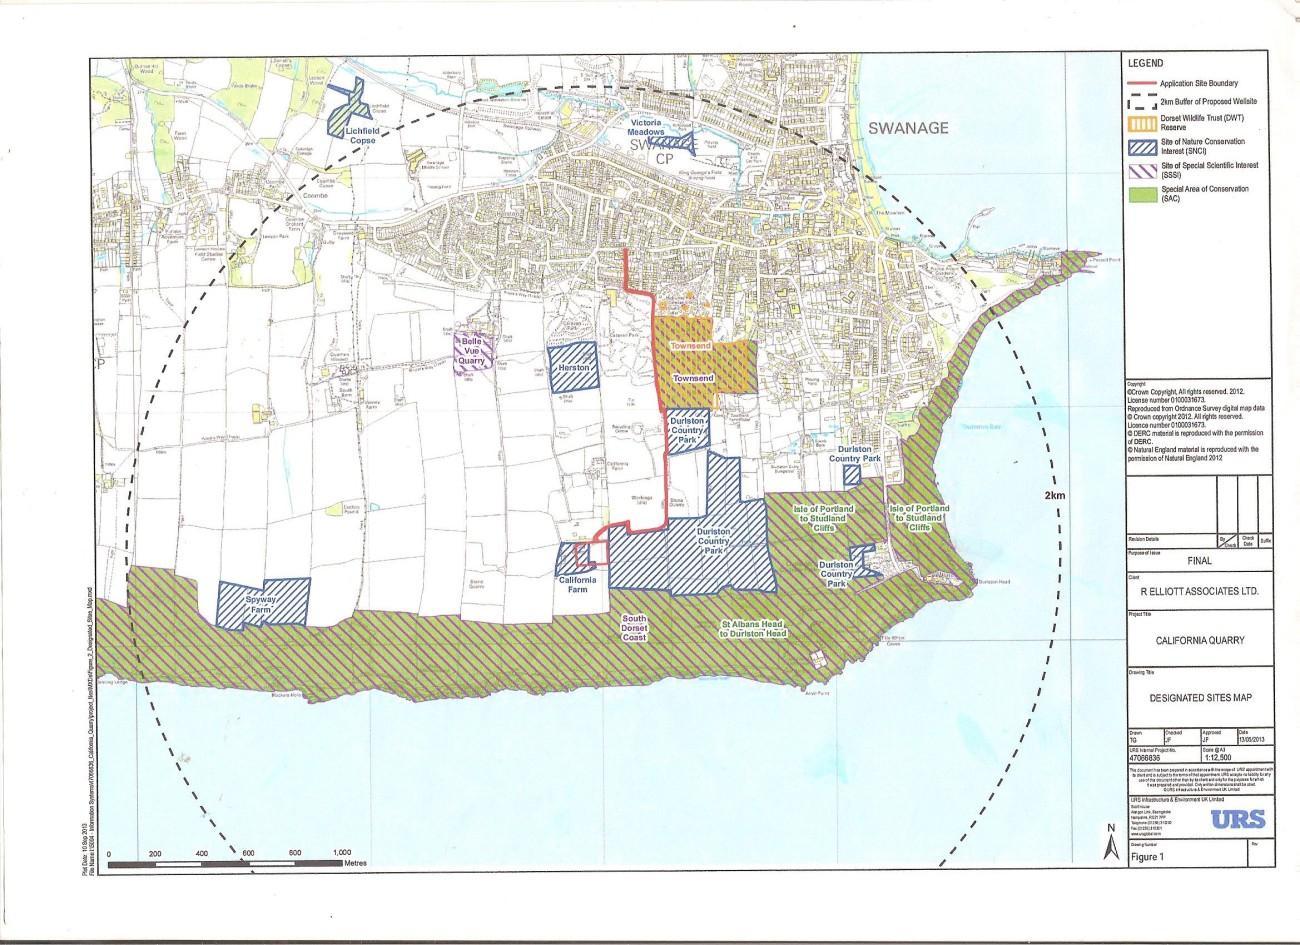 california-quarry-site_map